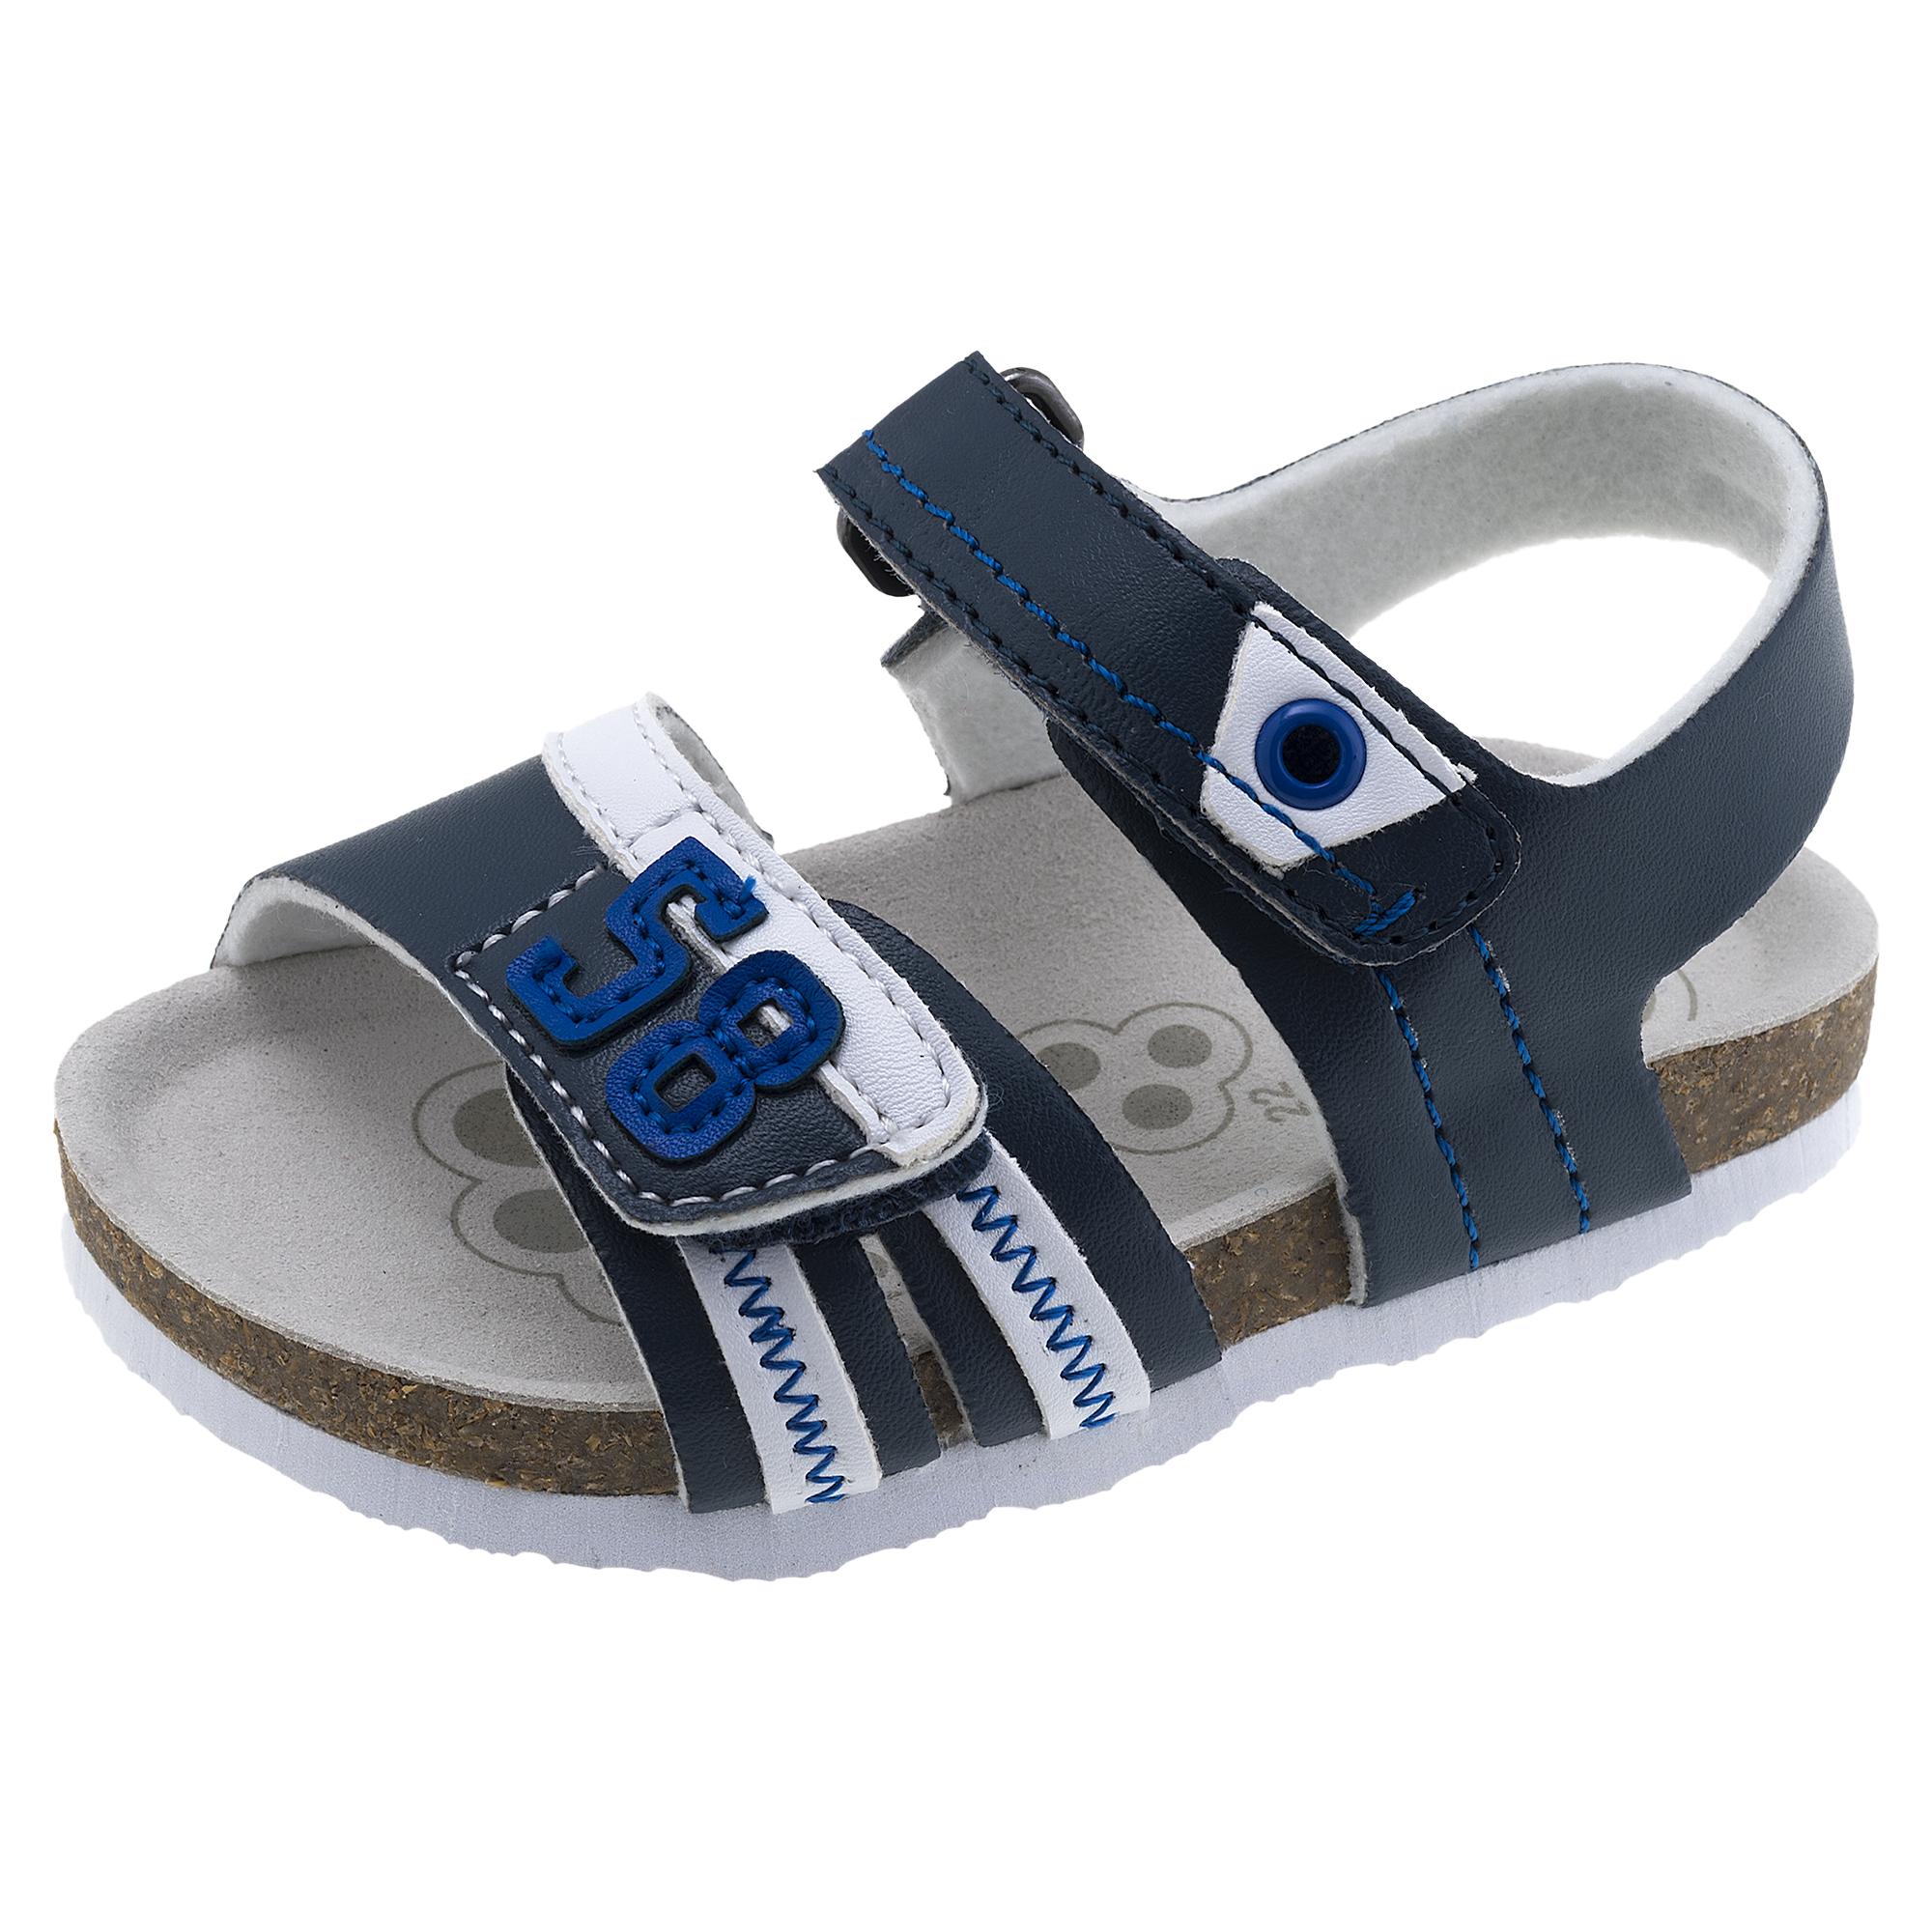 Sandale Copii Chicco Hedo, Bleumarin, 59726 imagine